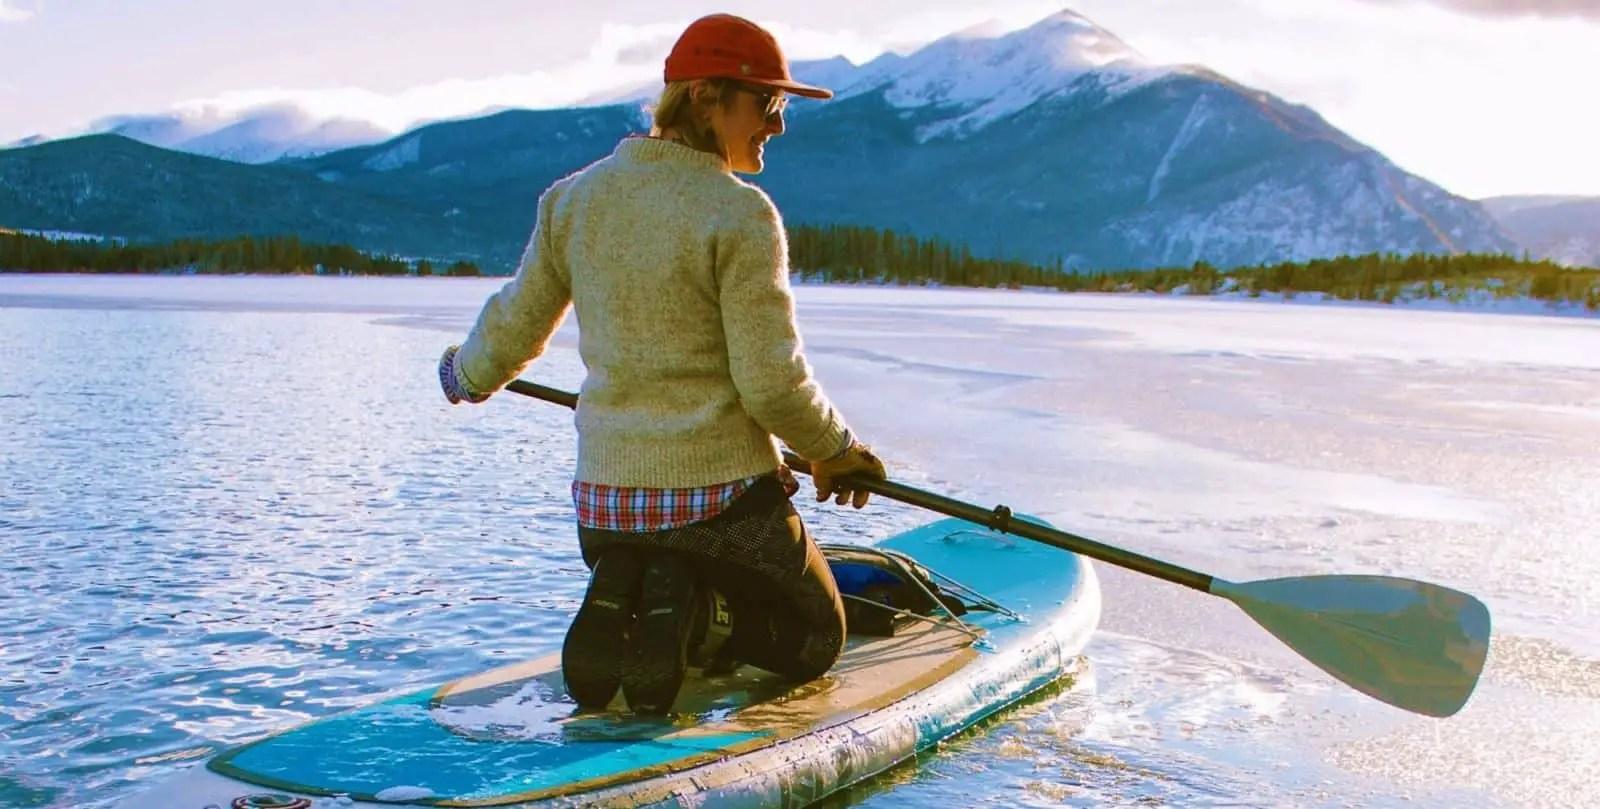 10 Paddle Board Camping Tips That Matter Seasoned Surfer